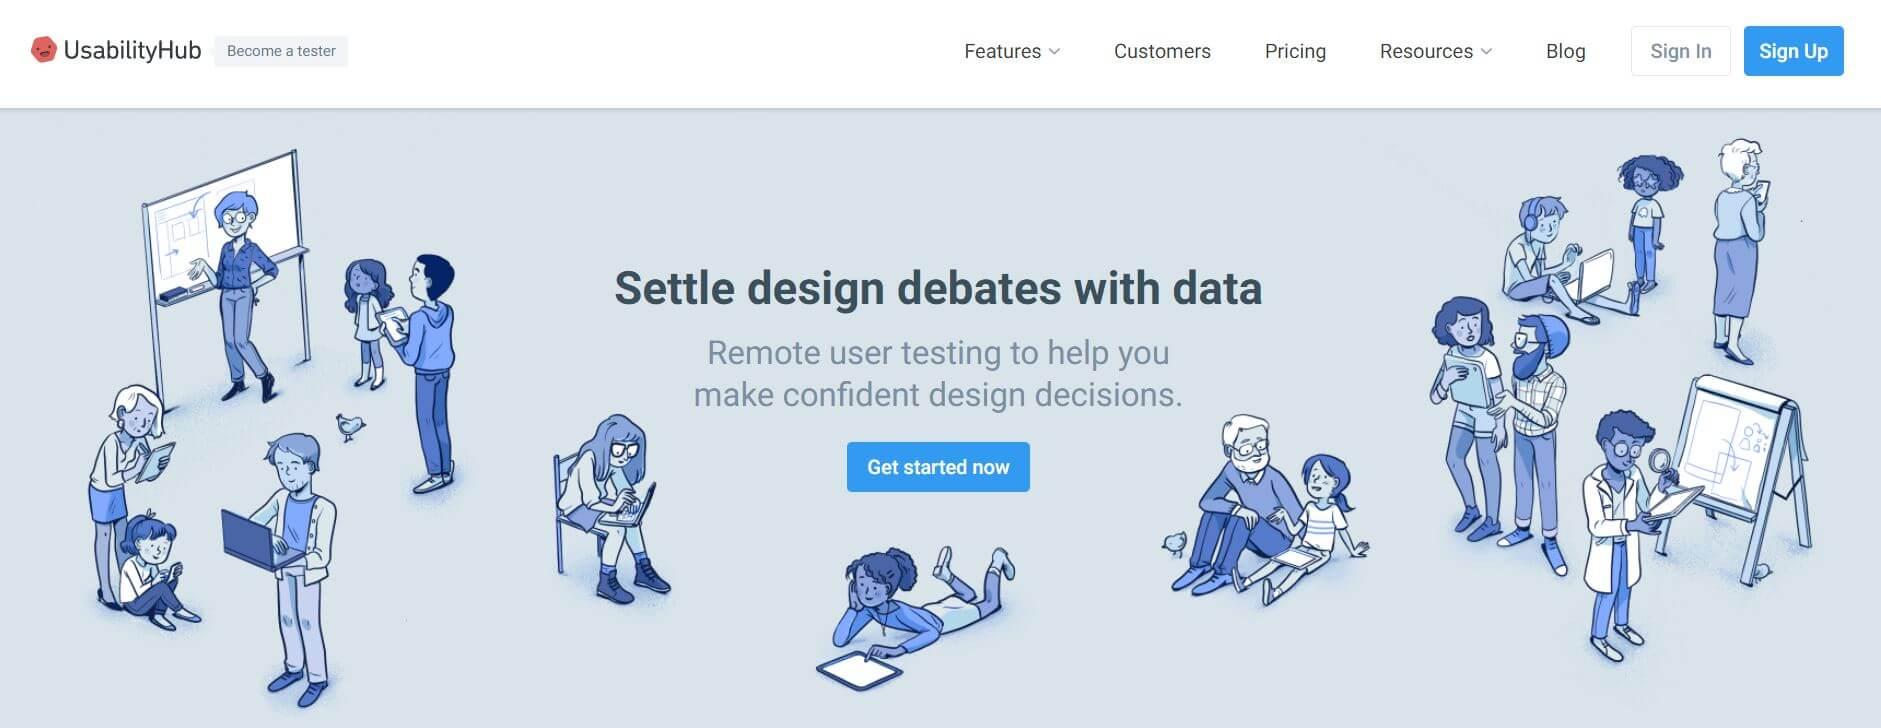 Usability Hub screenshot